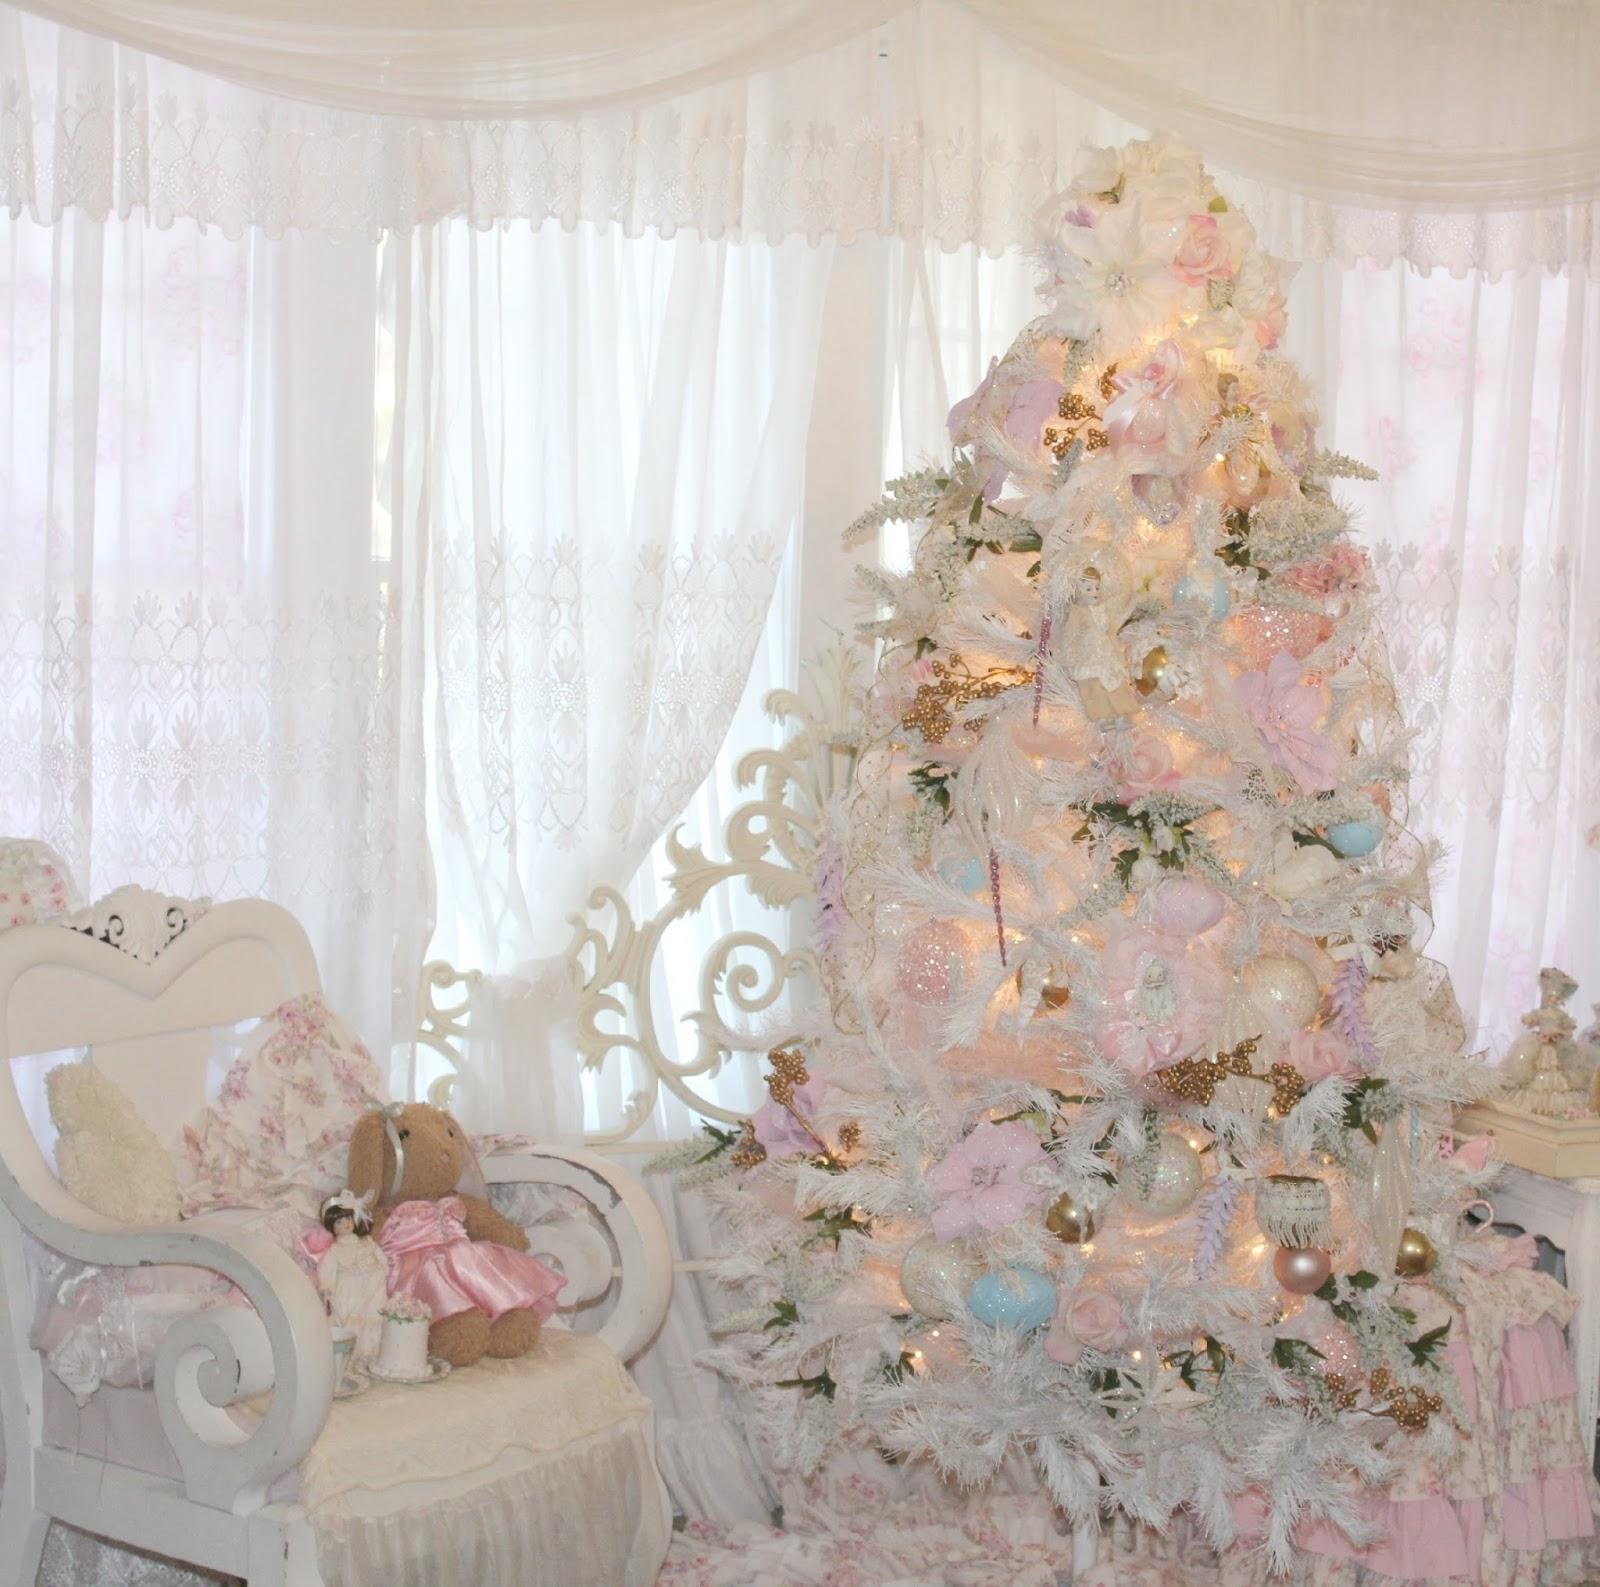 Olivia's Romantic Home: Inexpensive White Christmas Tree